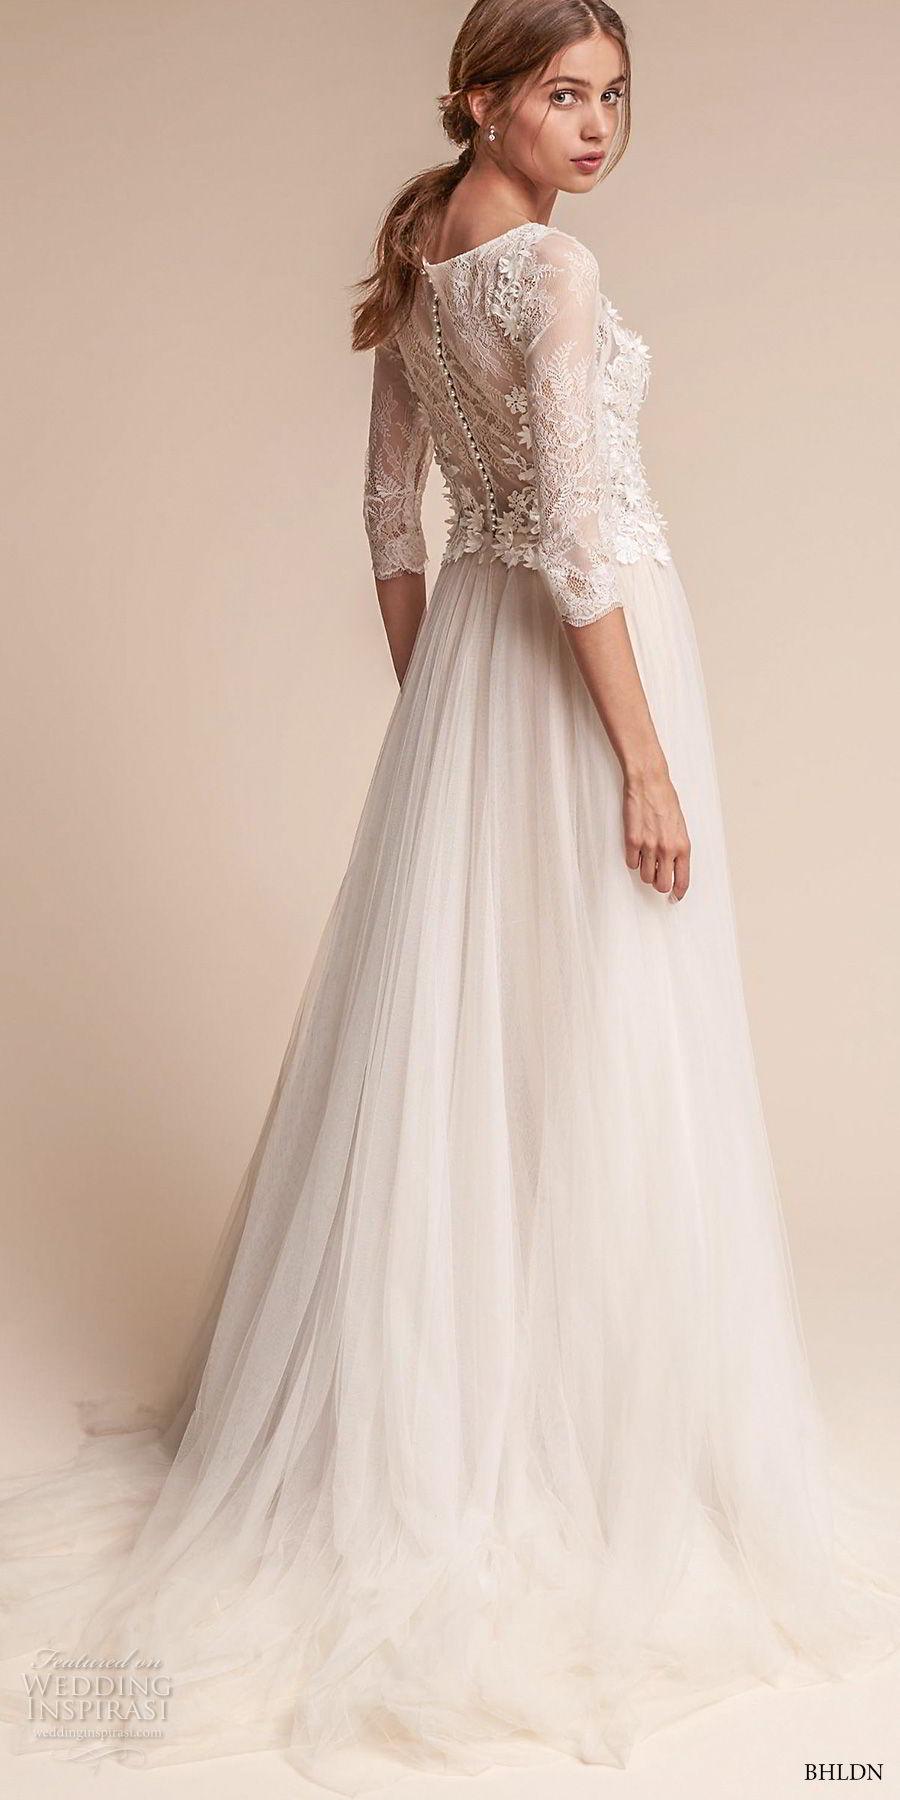 bhldn fall 2017  americana bridal three quarter sleeves bateau neck heavily embellished bodice tulle skirt romantic soft a  lne wedding dress covered lace back sweep train (amelia) bv